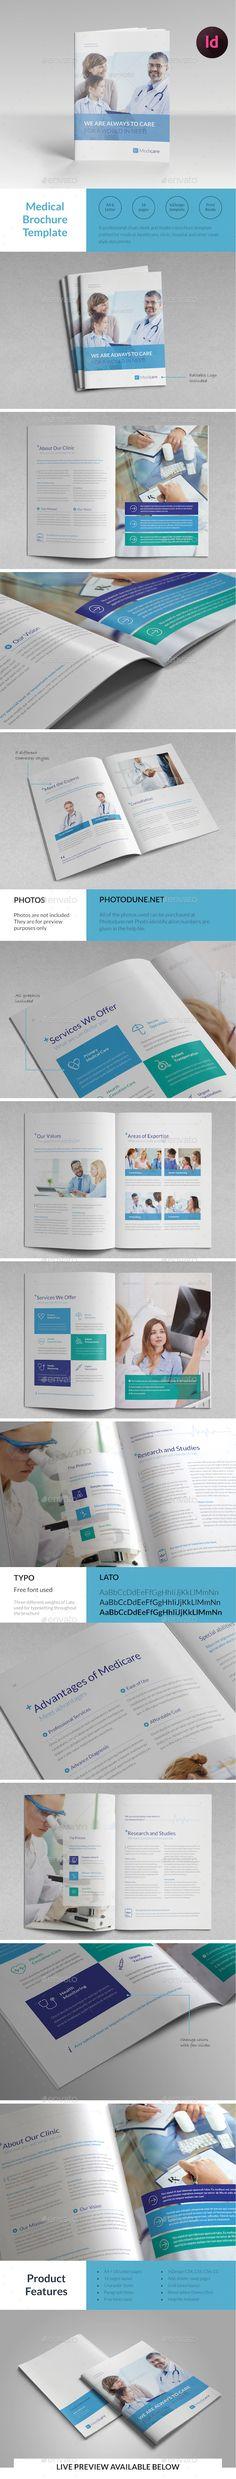 Medical Brochure Template InDesign INDD. Download here: http://graphicriver.net/item/medical-brochure-template/15249716?ref=ksioks